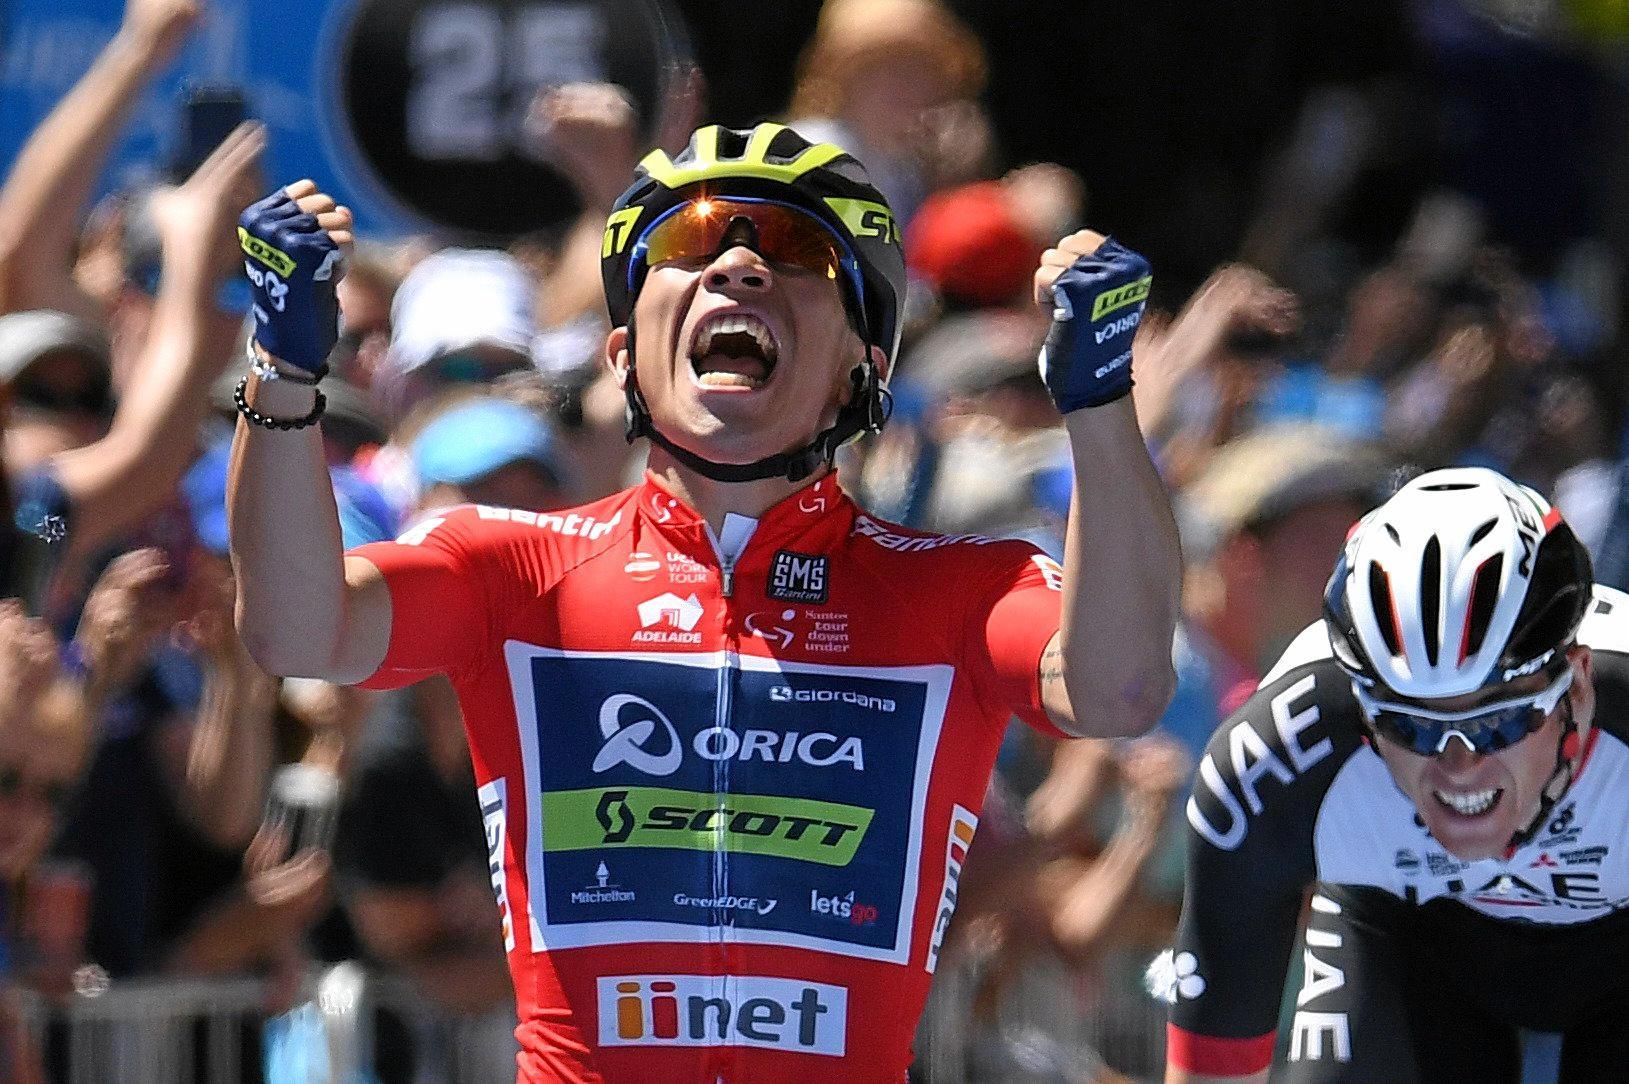 Australian rider Caleb Ewan of team Orica-Scott (centre) celebrates winning stage four of the Tour Down Under in Campbelltown near Adelaide.